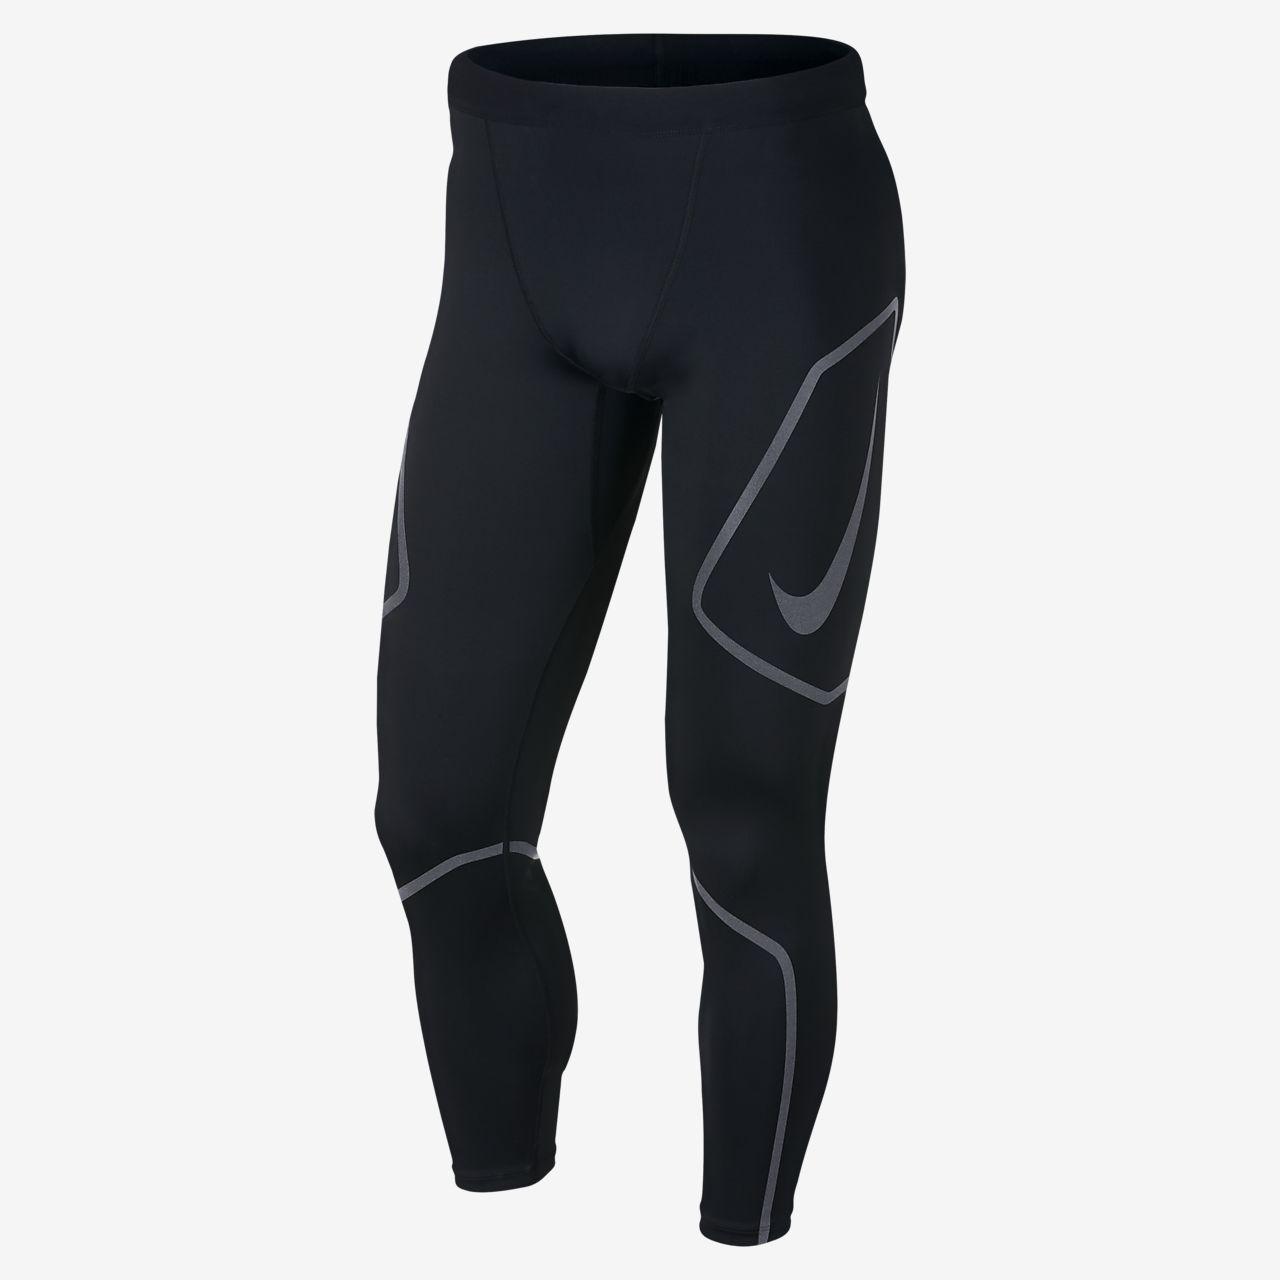 Nike Tech Herren-Lauf-Tights